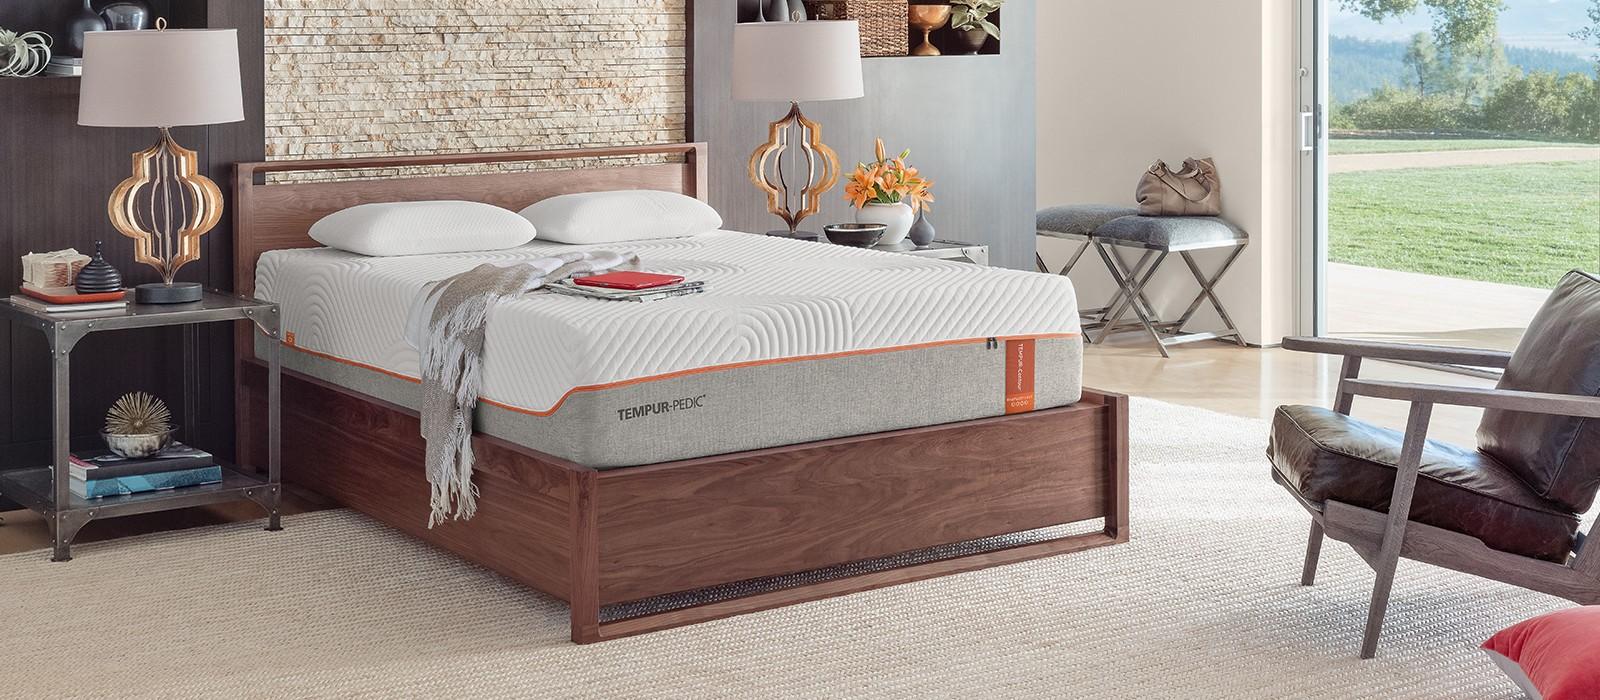 rhapsody luxe mattress tempurpedic - Tempurpedic Mattress Cost